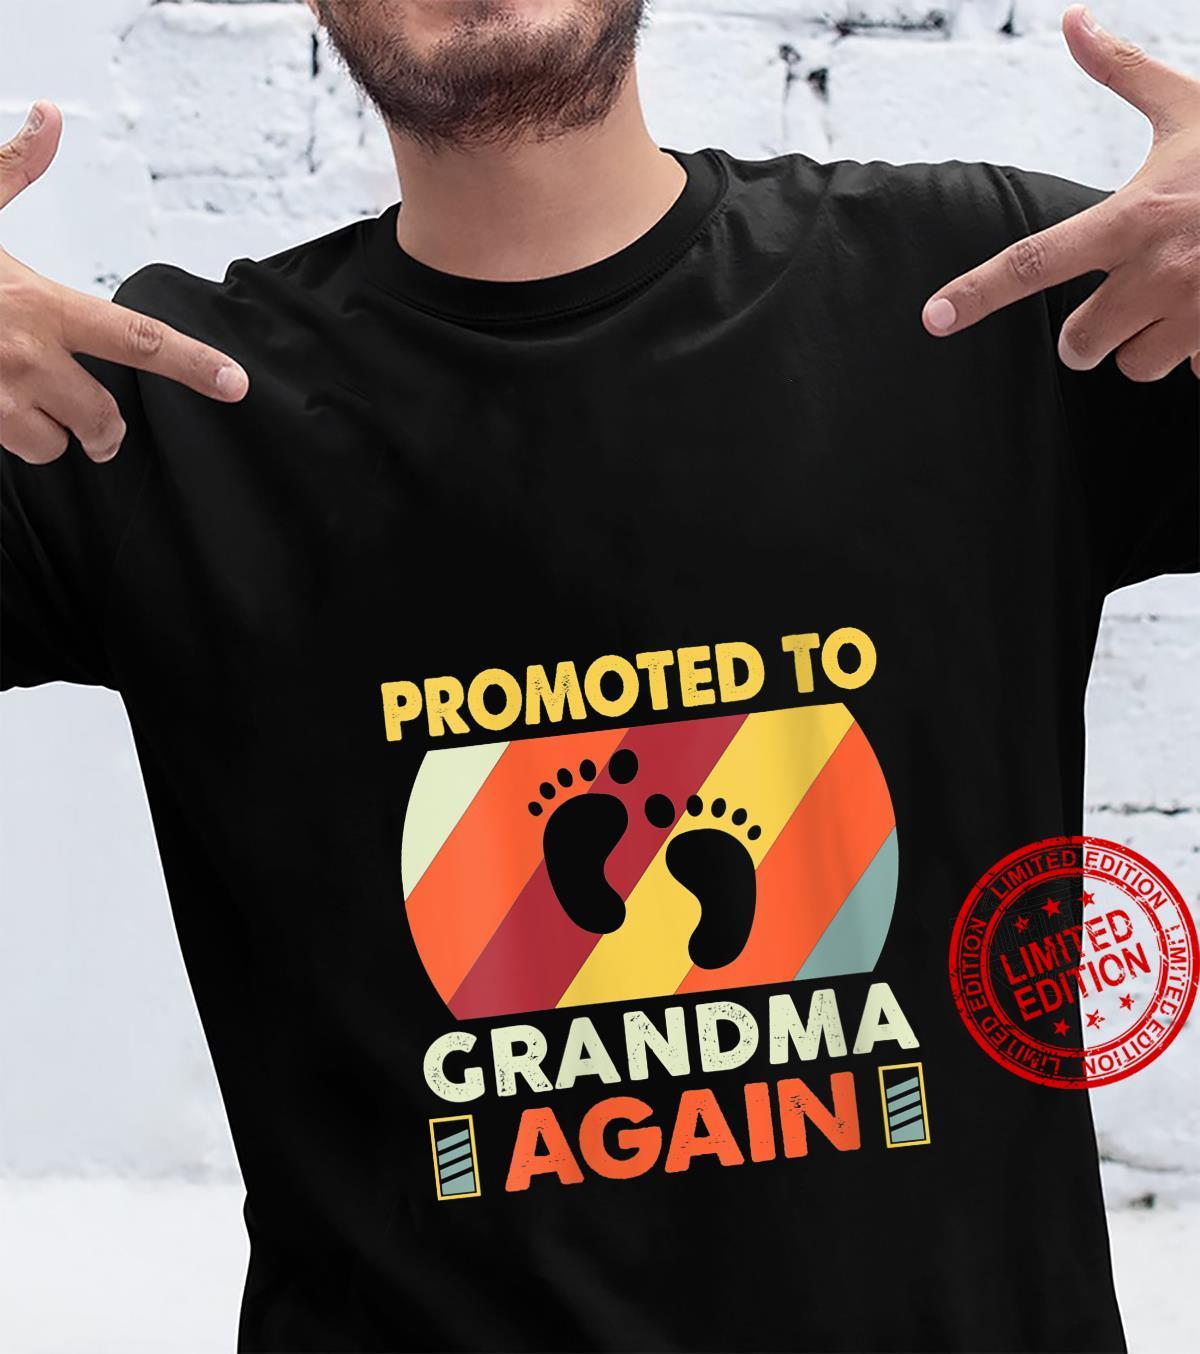 Womens Going To Be Grandma Again Vintage Promoted to Grandma Again Shirt